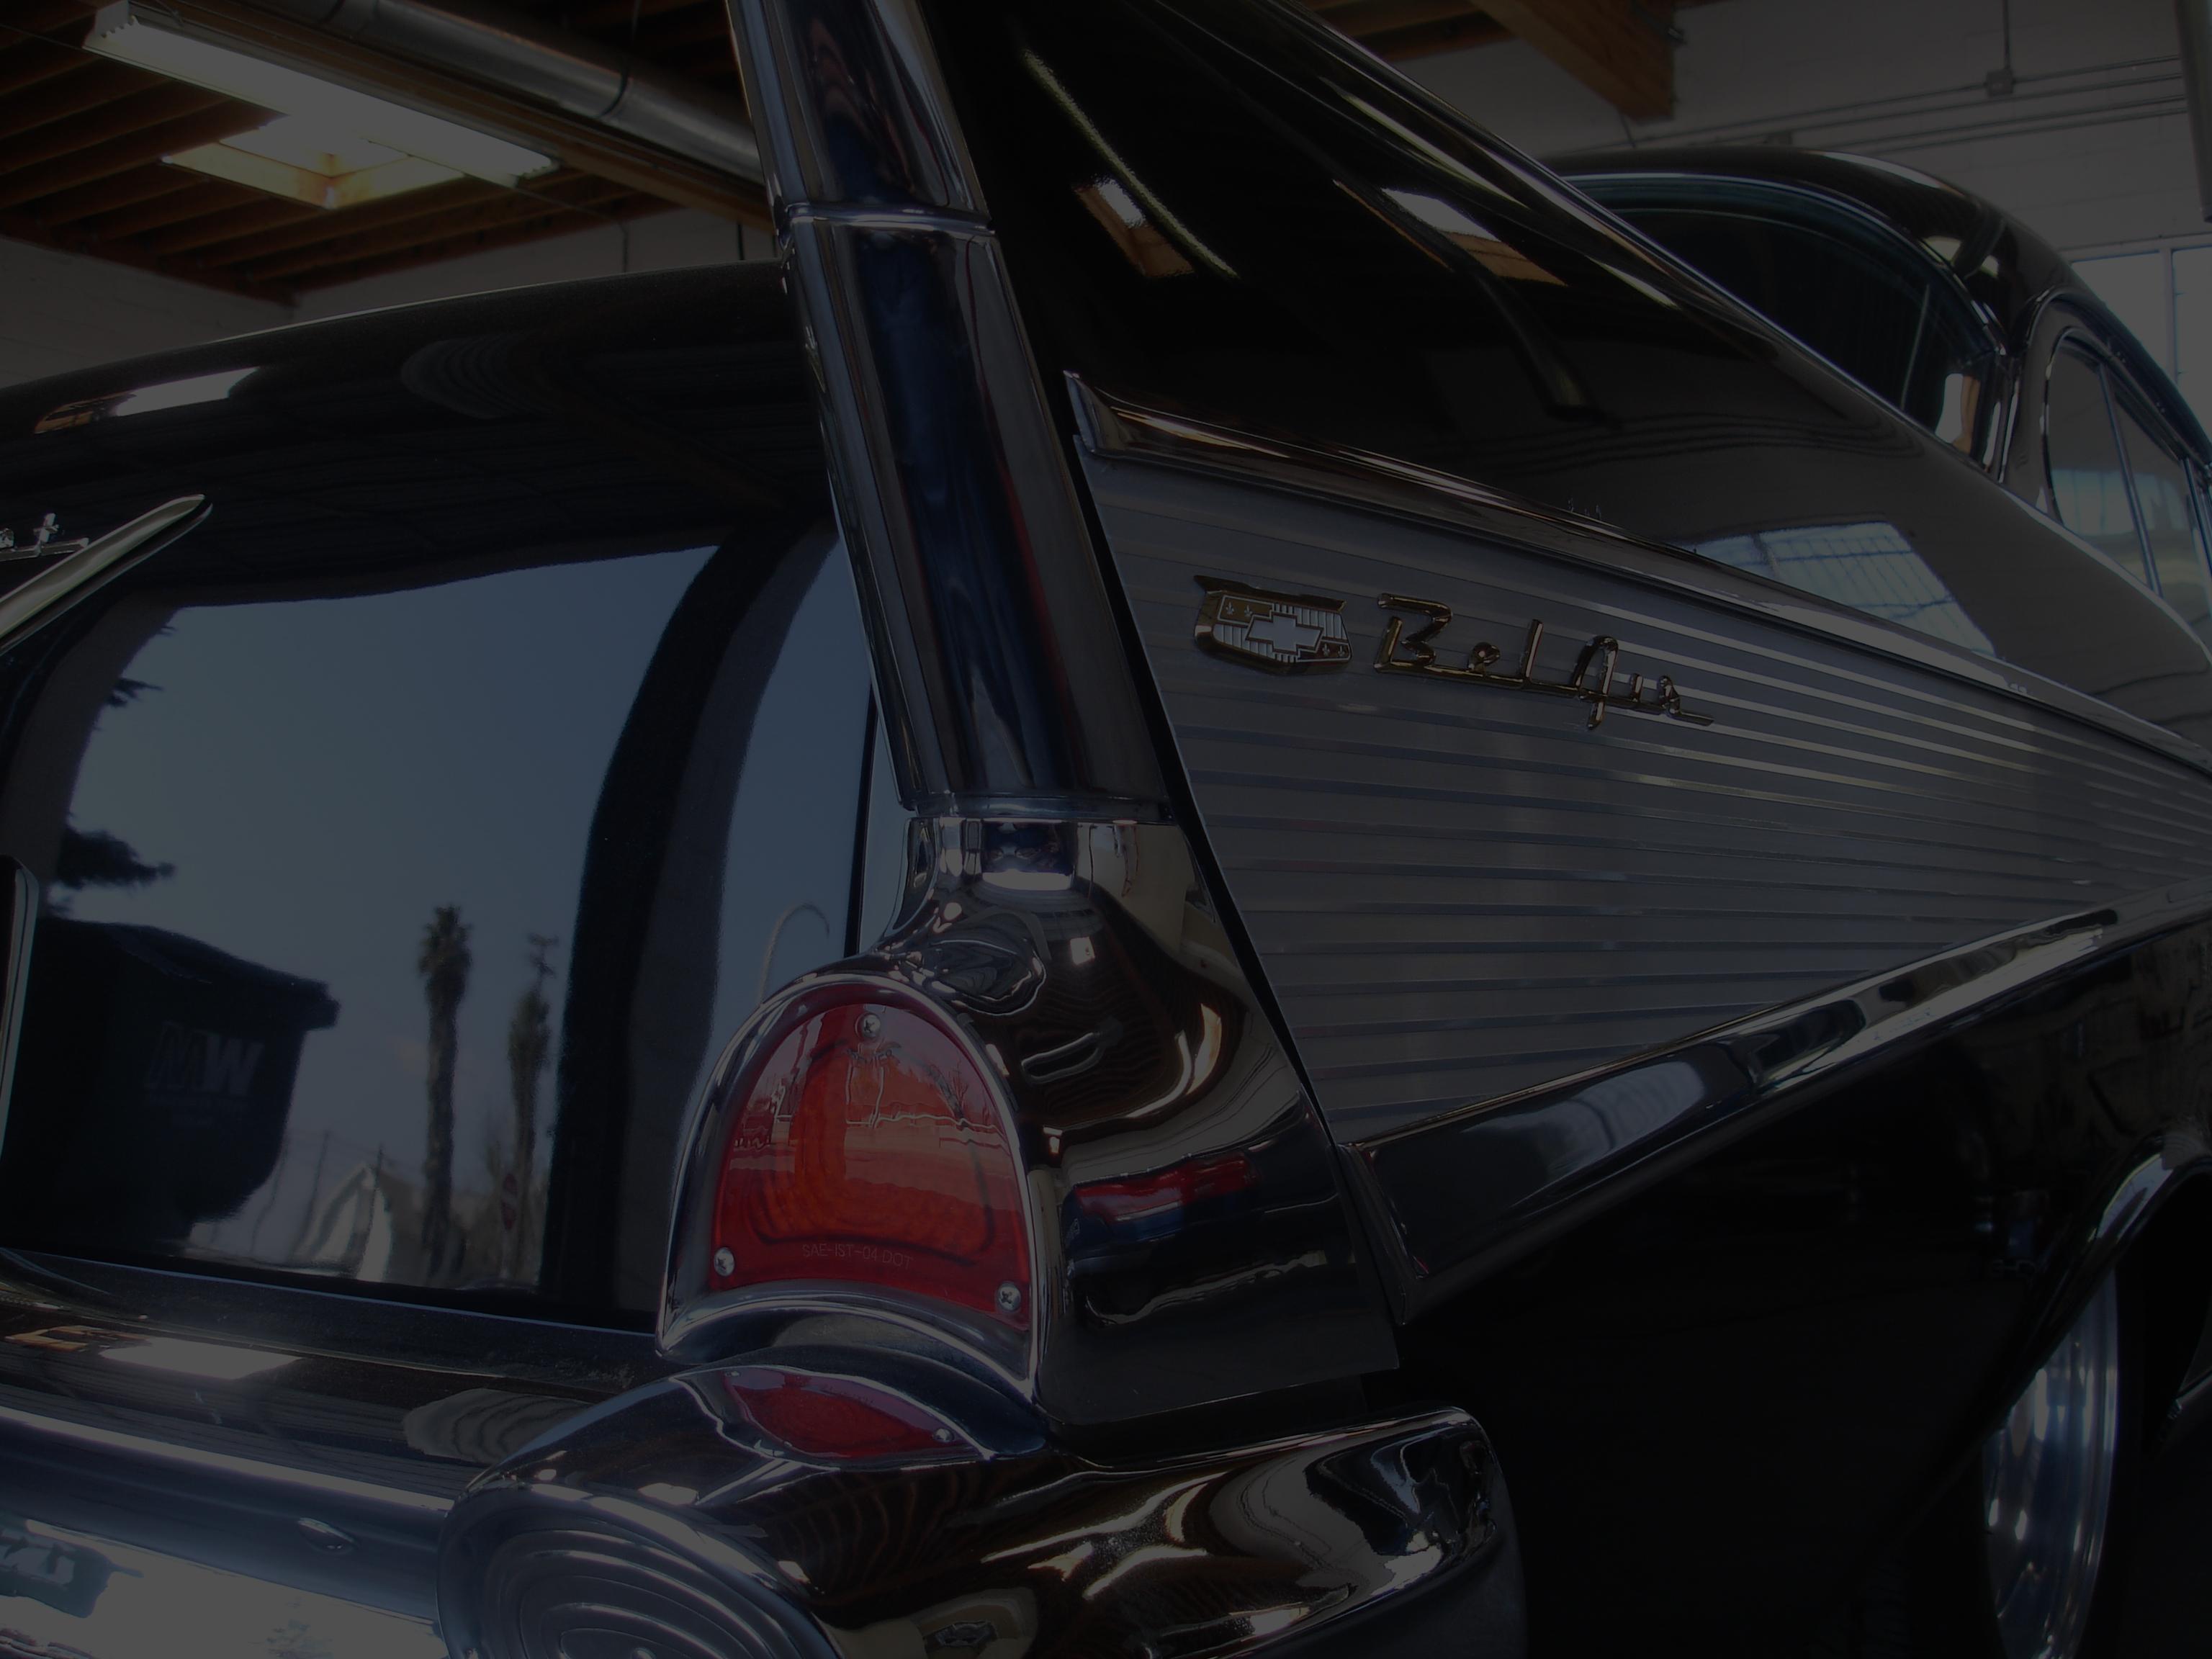 Classic Car at Hewitt Alinement in Stockton, California